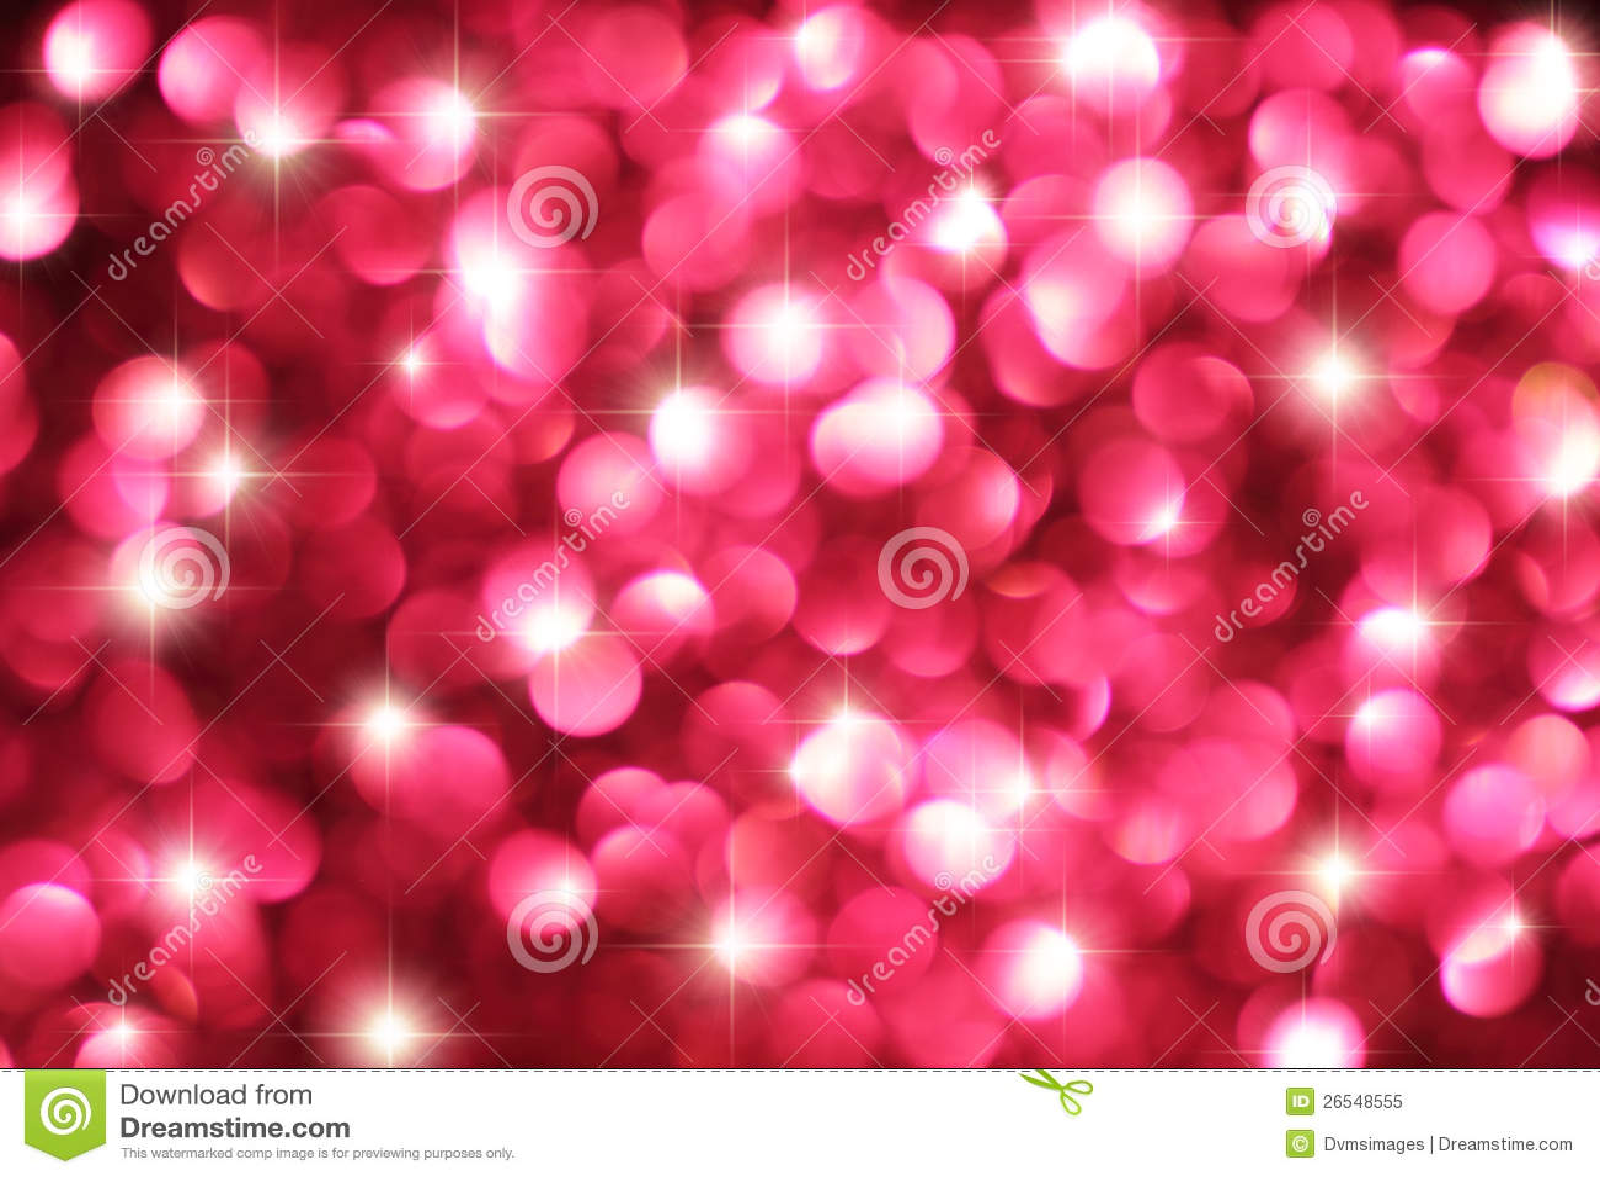 pink stars backgroundpink wallpaperpink - photo #9